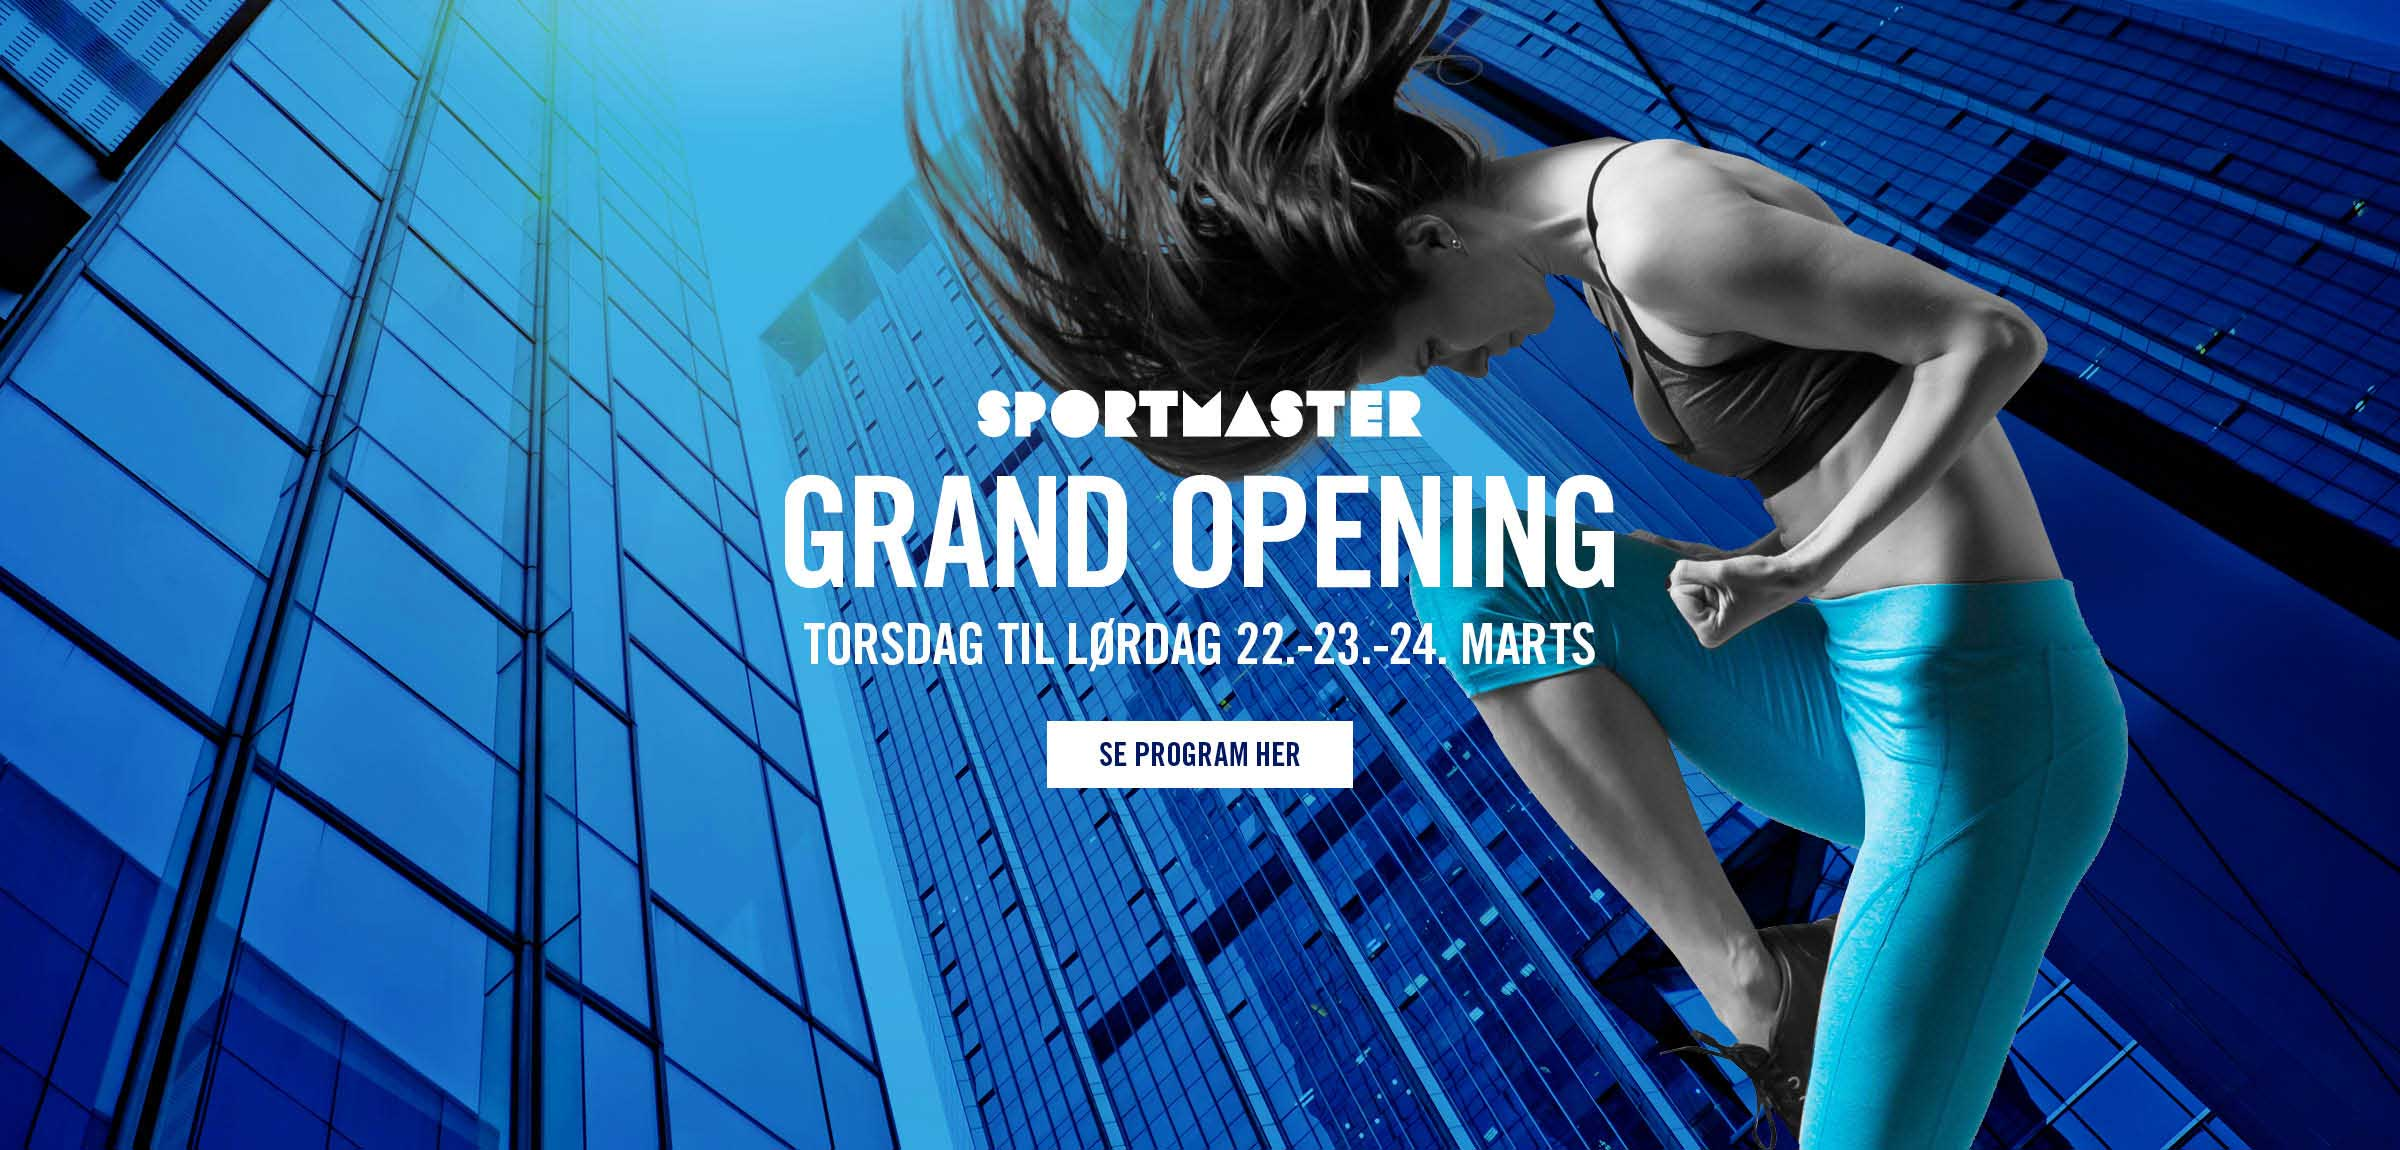 Sportmaster Grand Opening